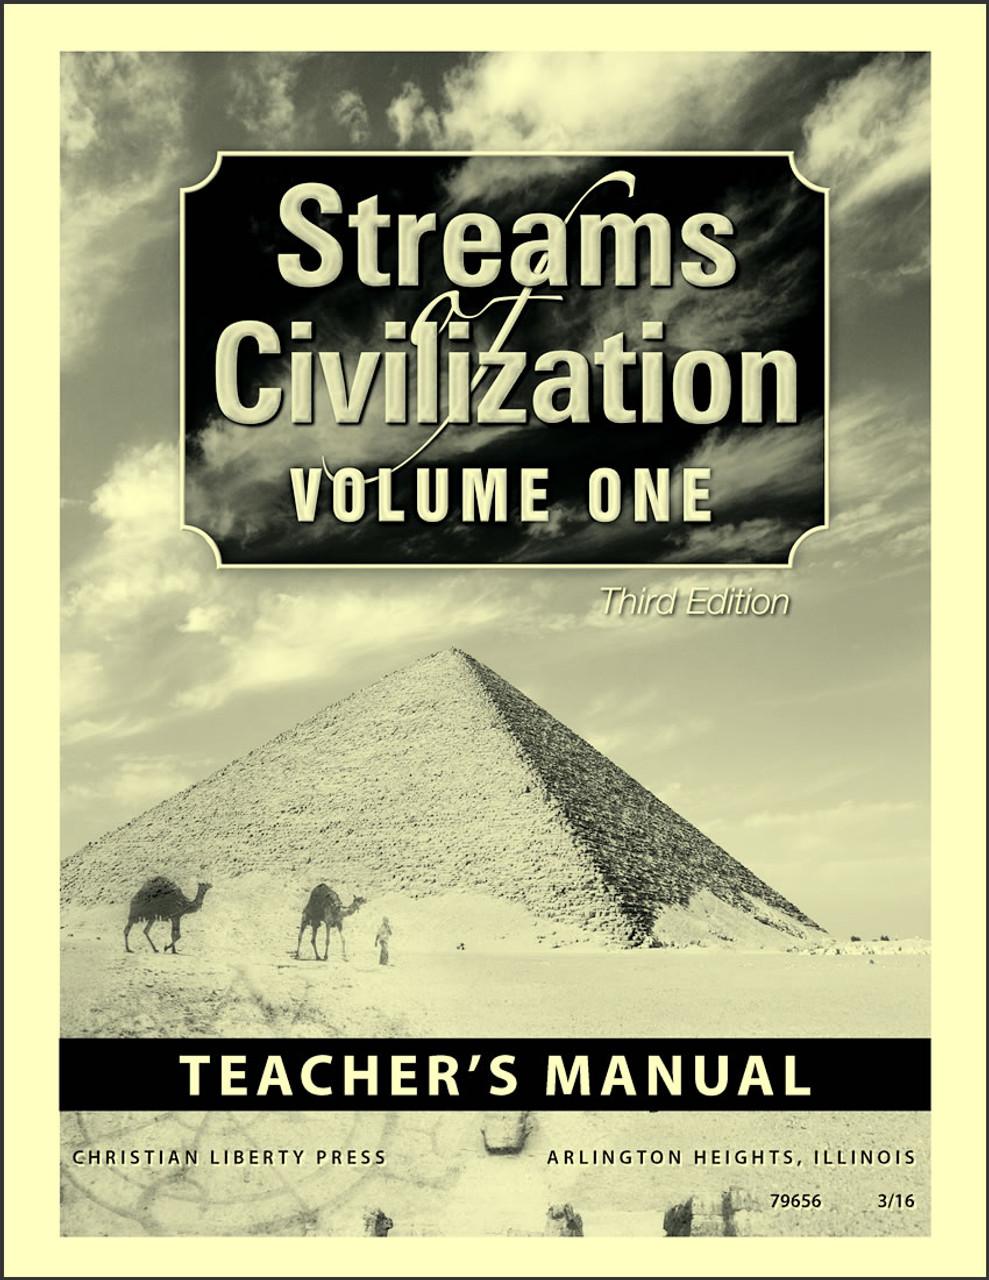 Streams of Civilization Volume One, 3rd edition - Teacher's Manual